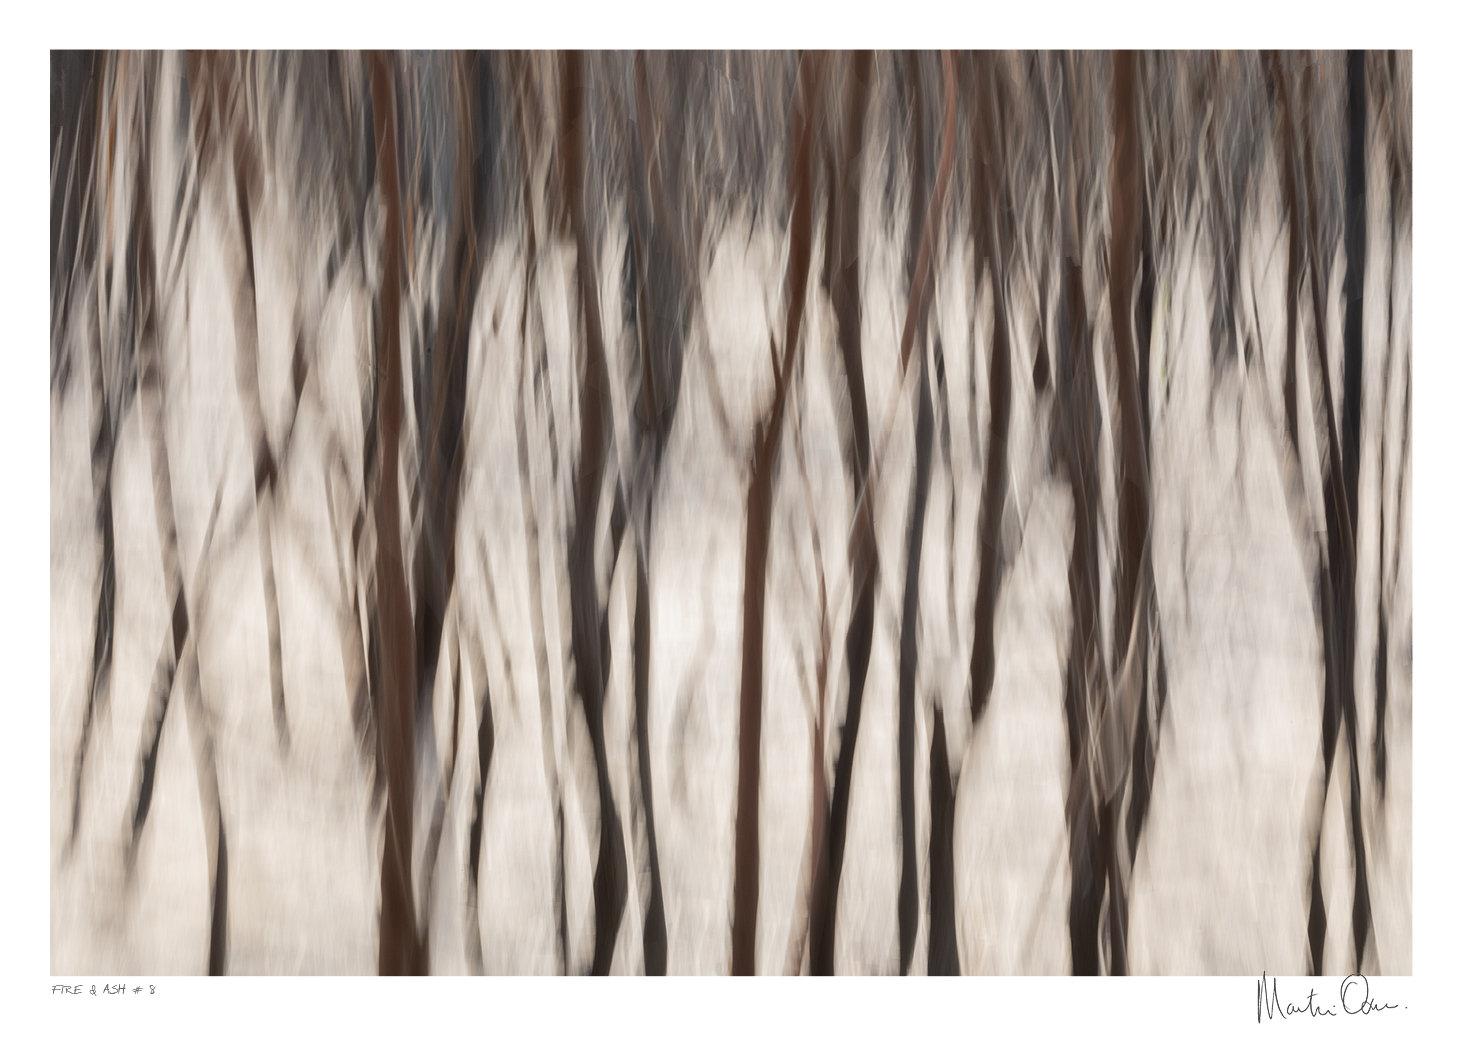 Fire and Ash No.8 | Martin Osner